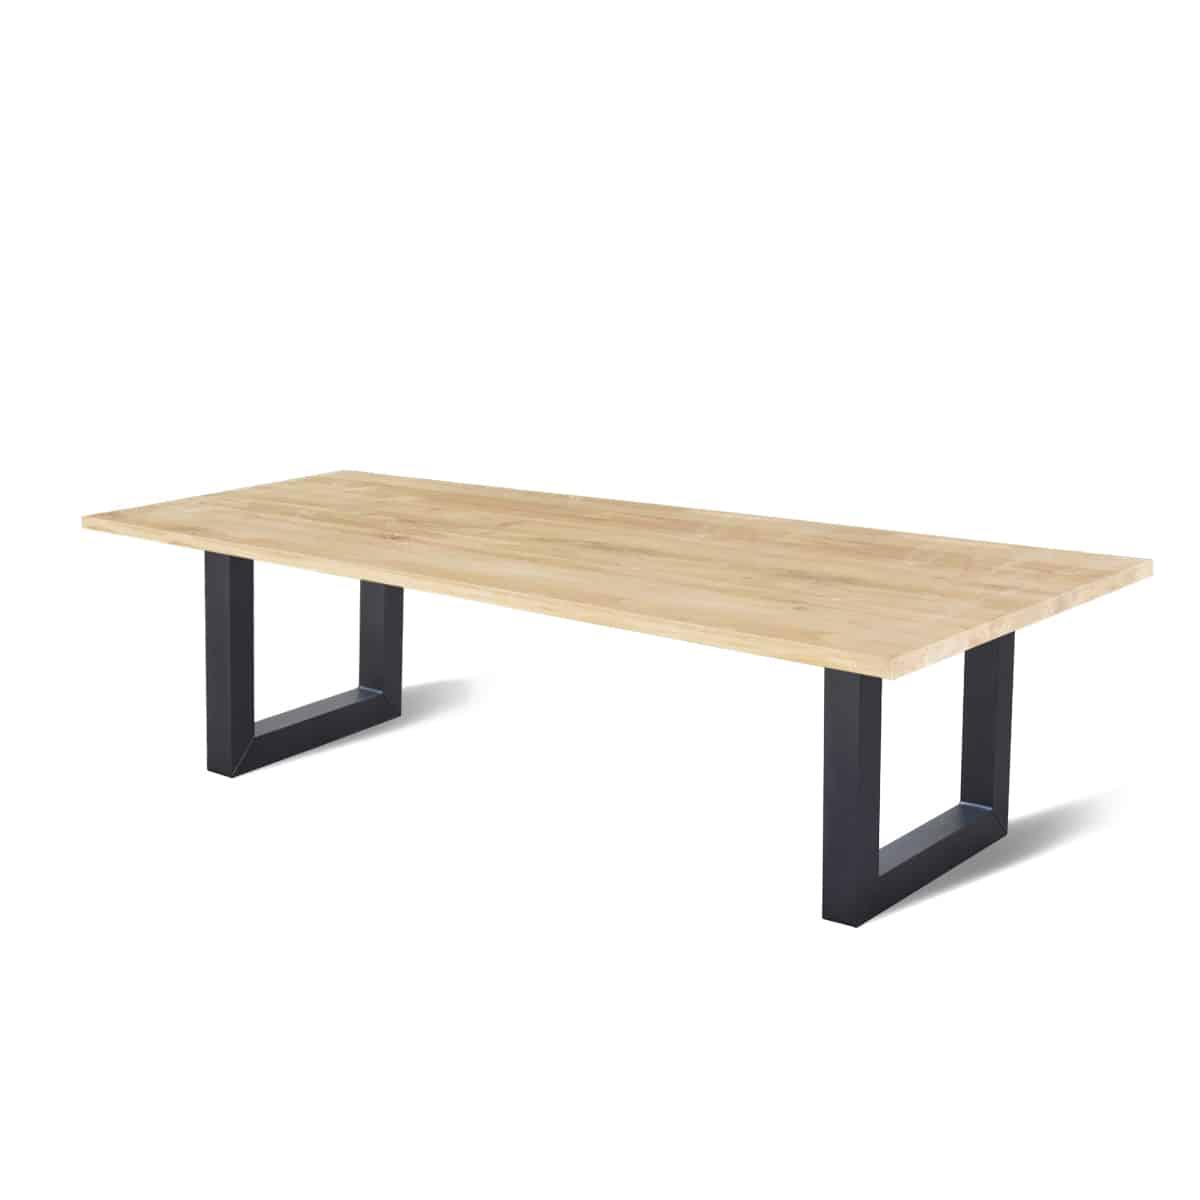 recht industriele eetkamer keuken tafel eiken hout staal